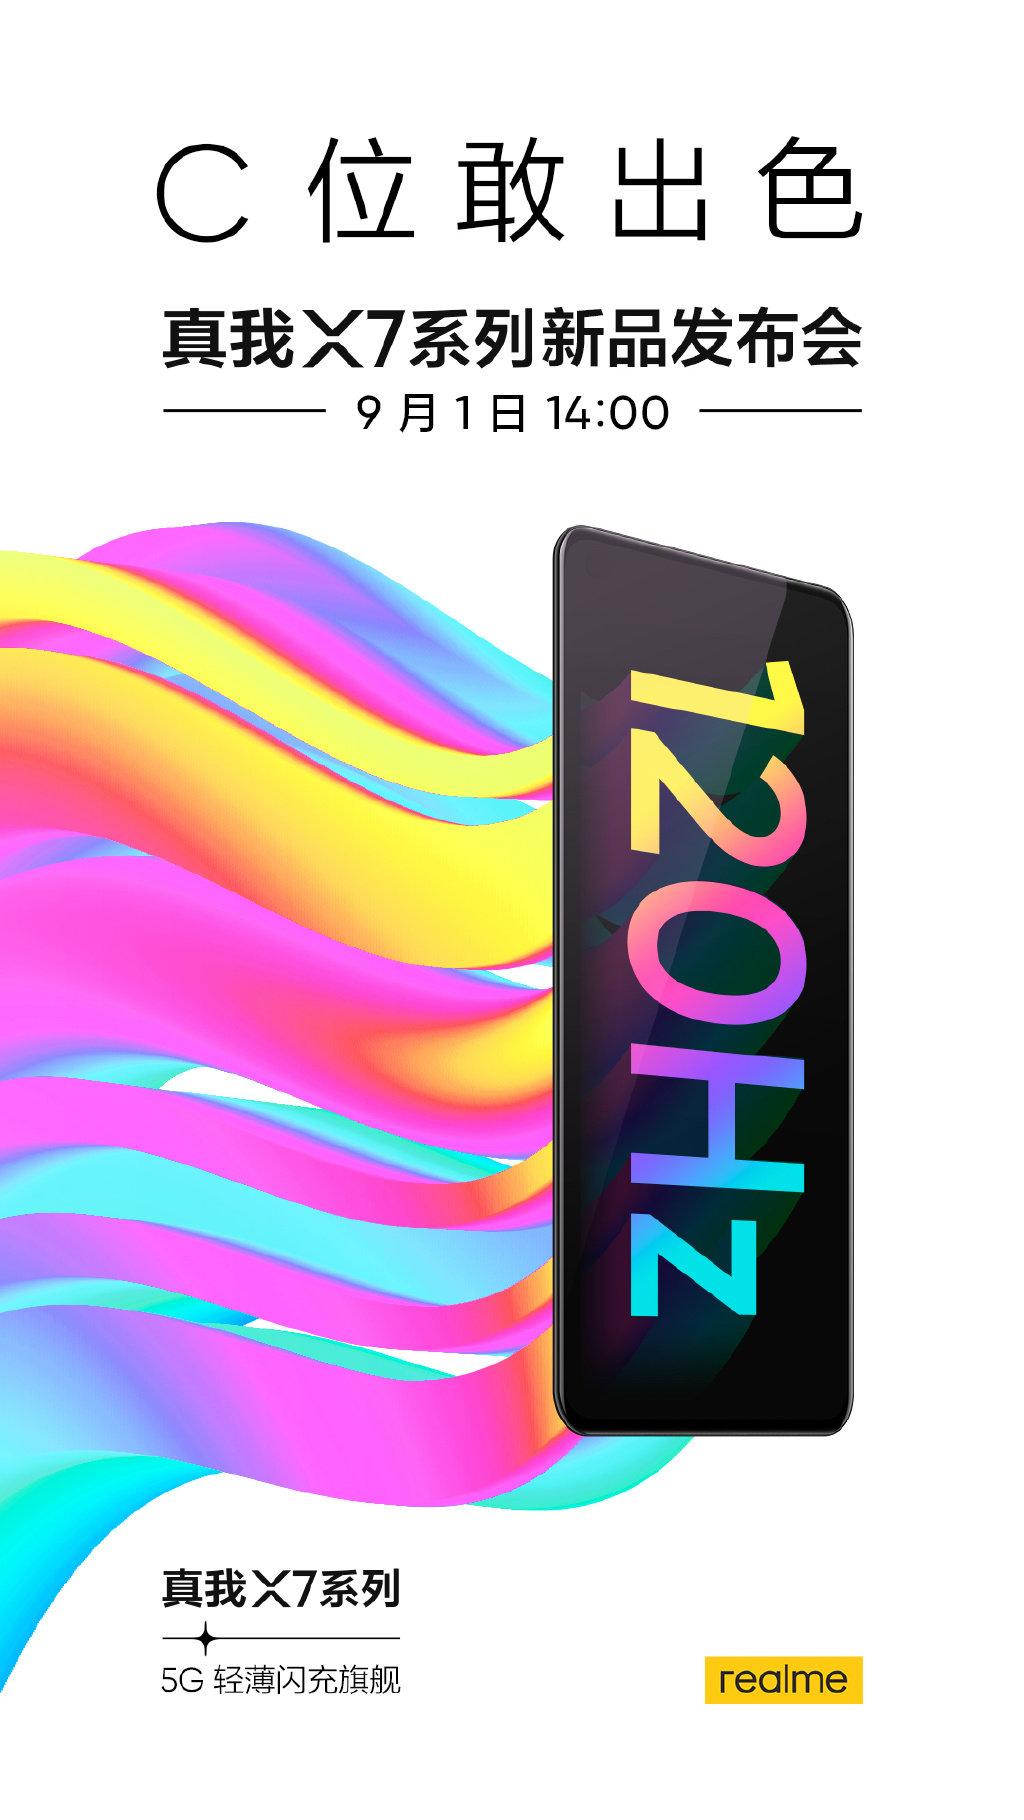 realme 真我 X7 系列官宣:120Hz 轻薄闪充旗舰 - 热点资讯 家电百科 第2张